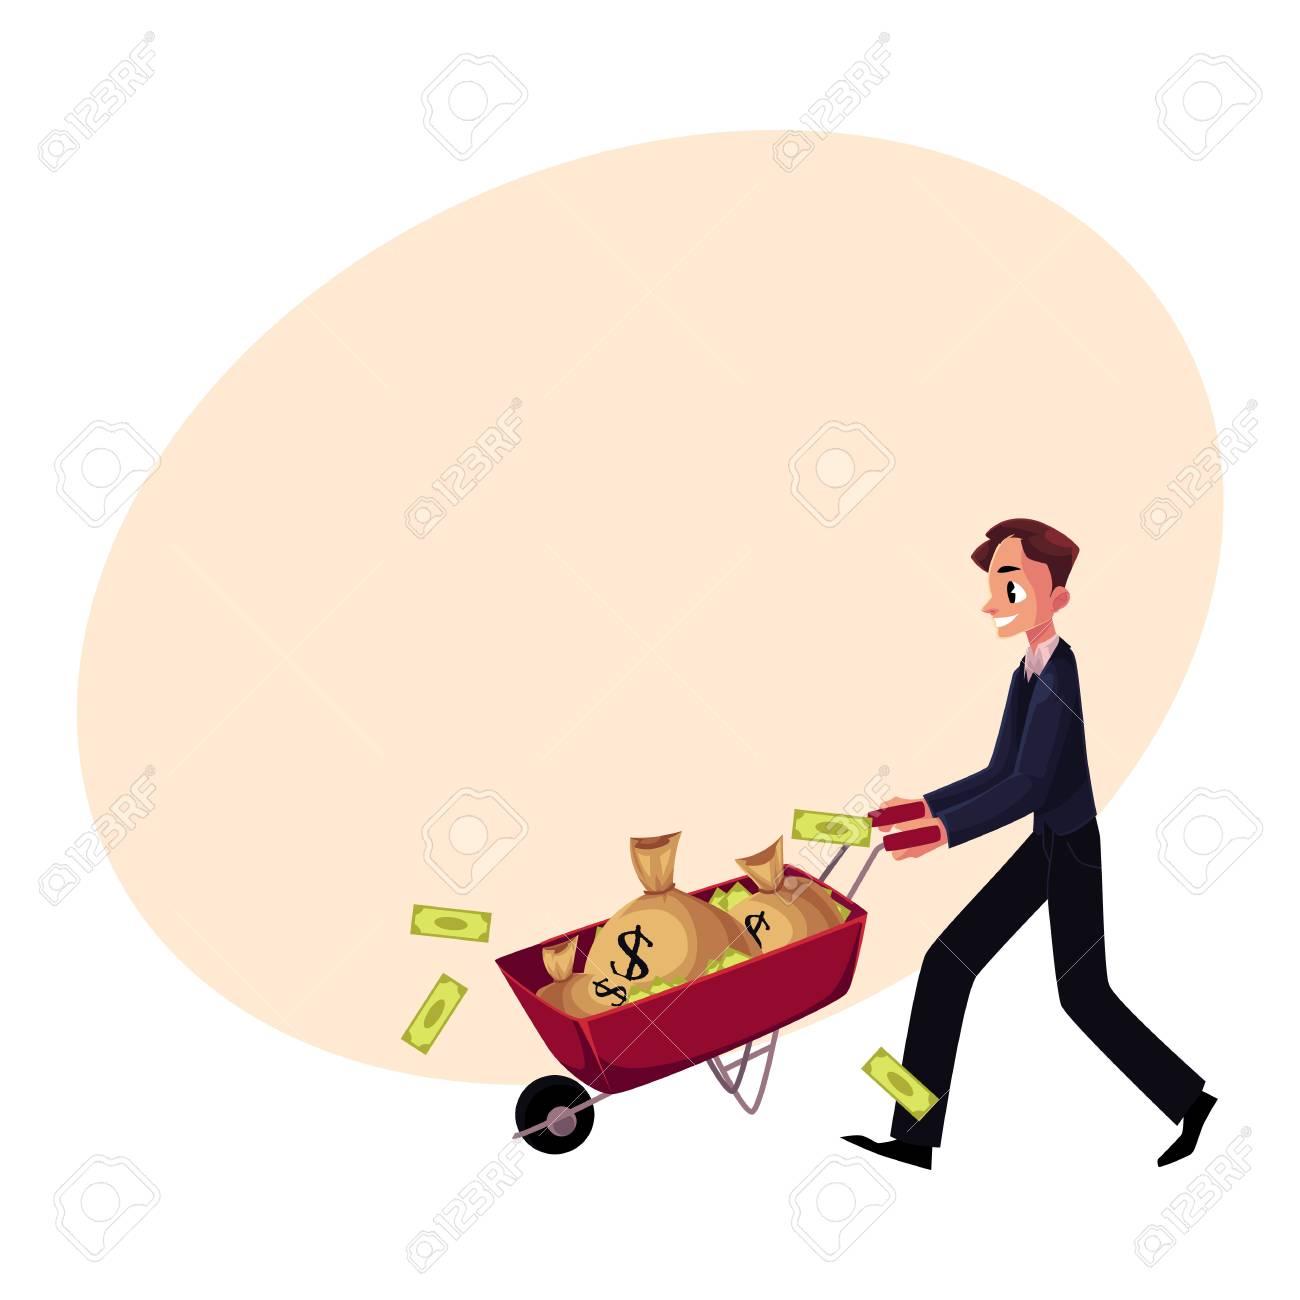 Struggling Retro Man Pushing Wheelbarrow Full Of Money in 2020 | Retro  illustration, Wheelbarrow, Clip art